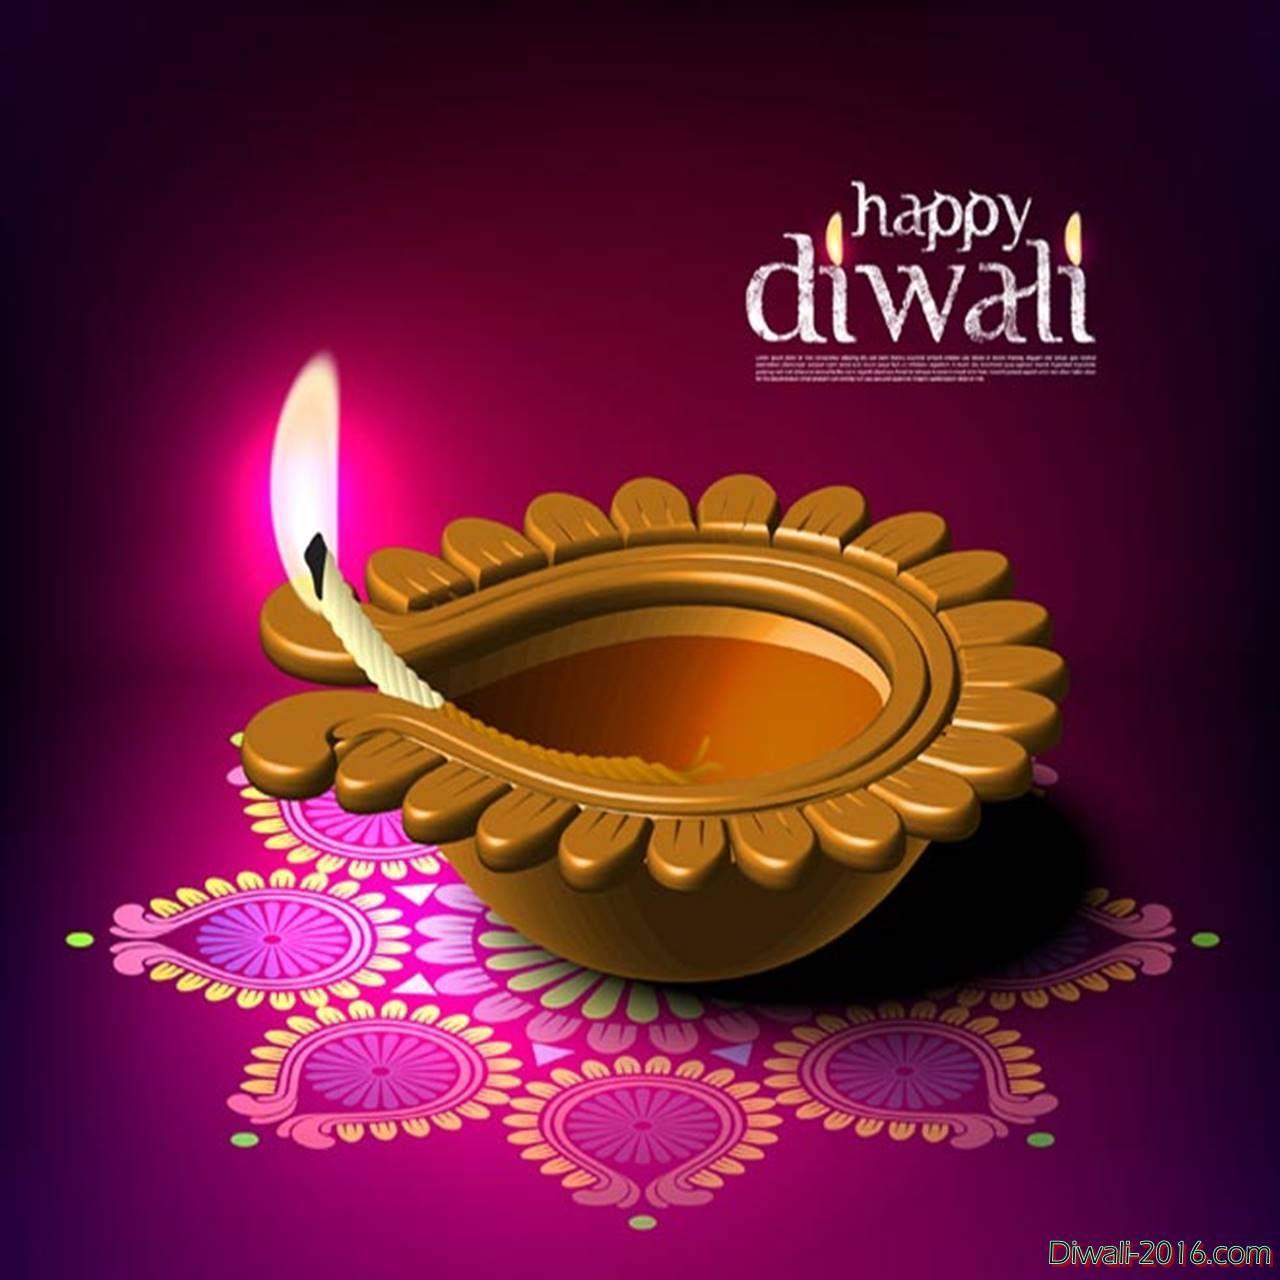 Best Happy Diwali Image 31 Top Images Of Happy Diwali